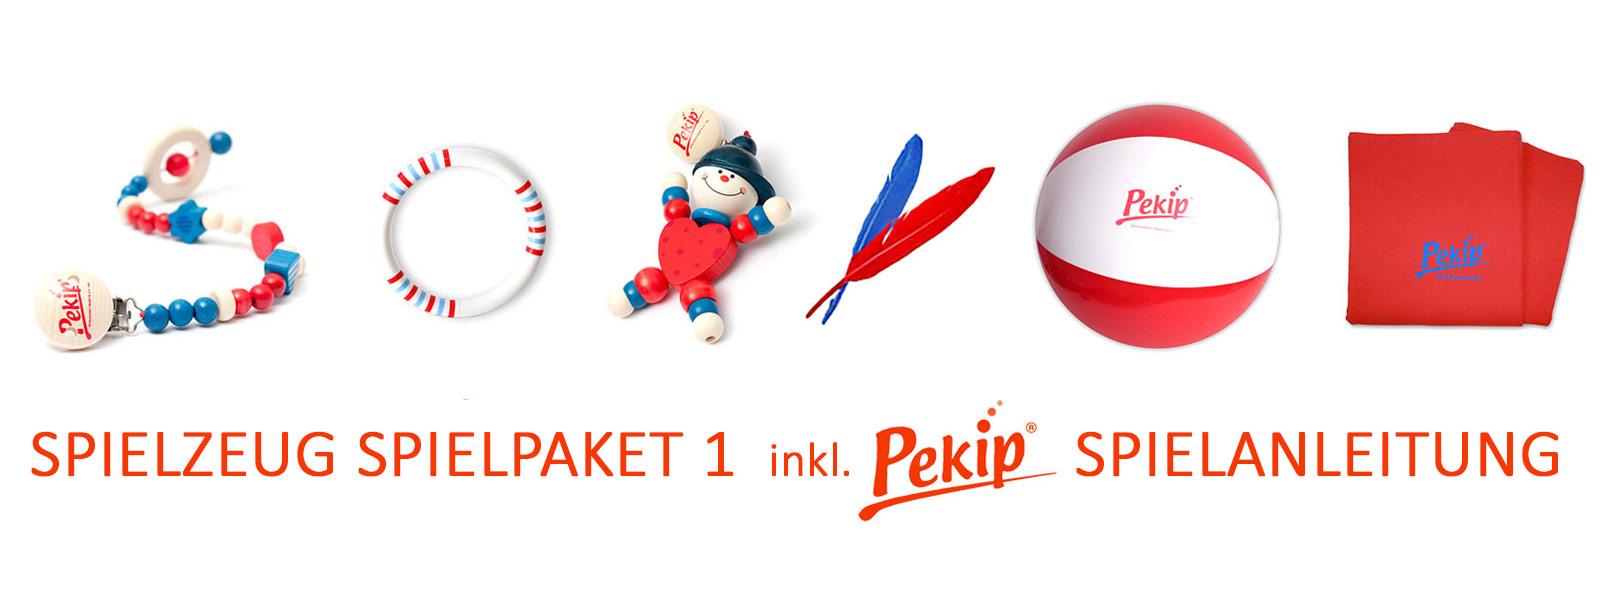 pekip-spielwaren-spielpaktet1-spielzeug-produkte-neu2NbwWqFo26NKh1